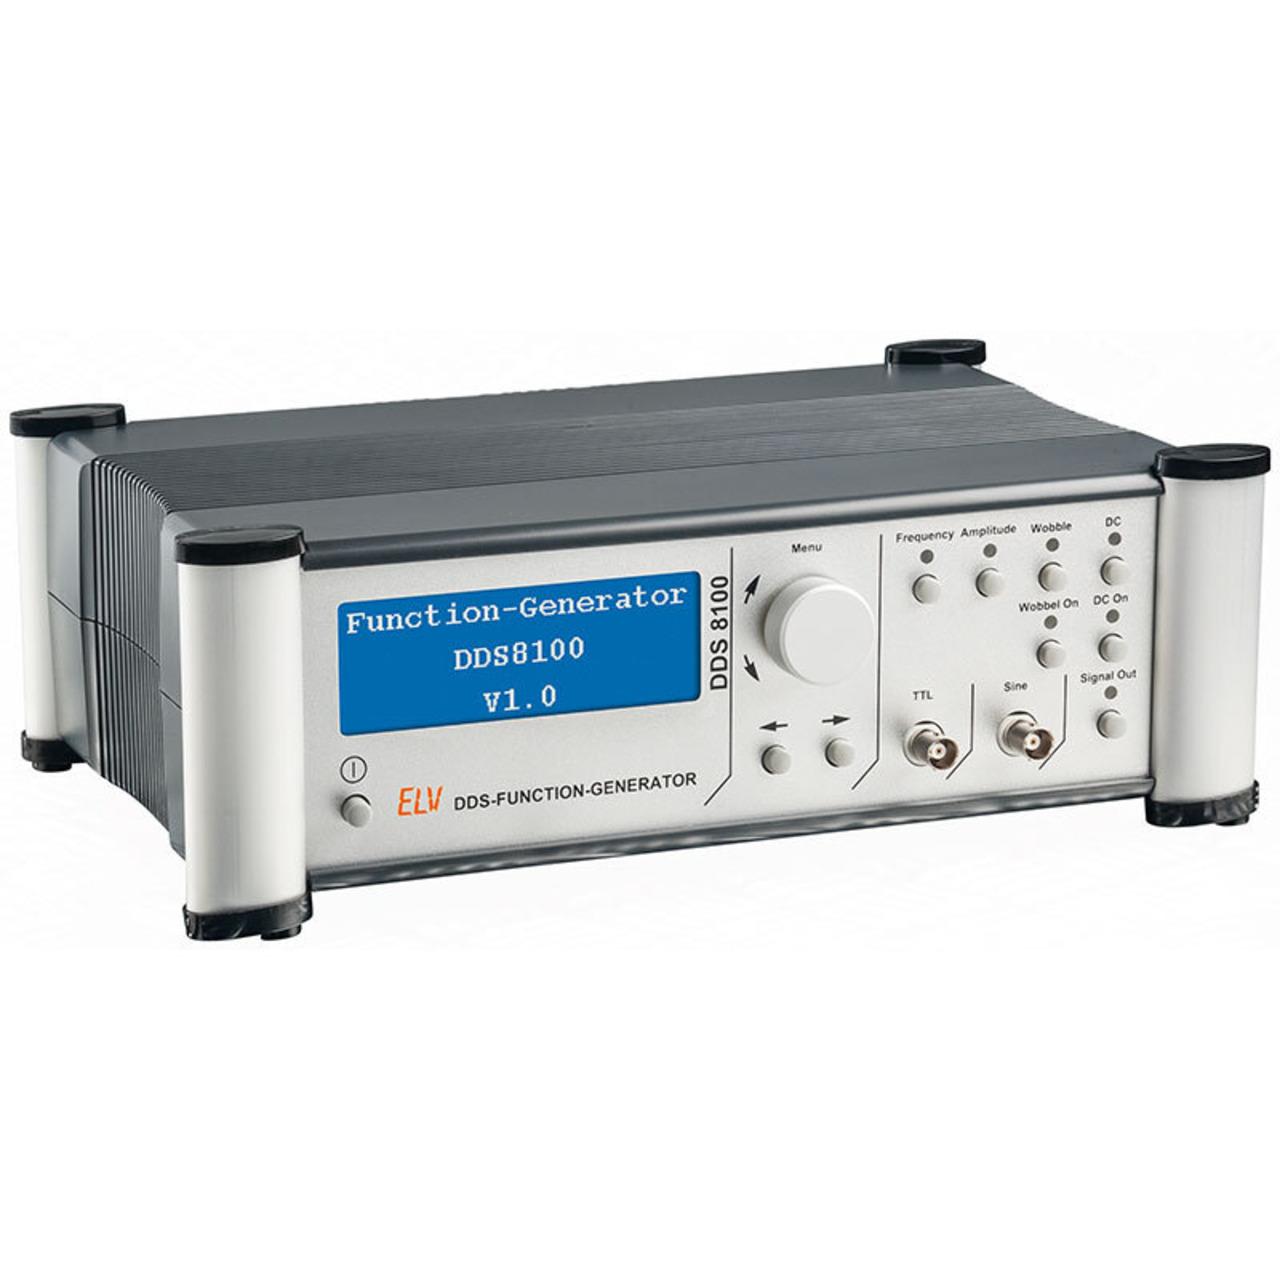 ELV Komplettbausatz 100 MHz-Funktionsgenerator DDS8100